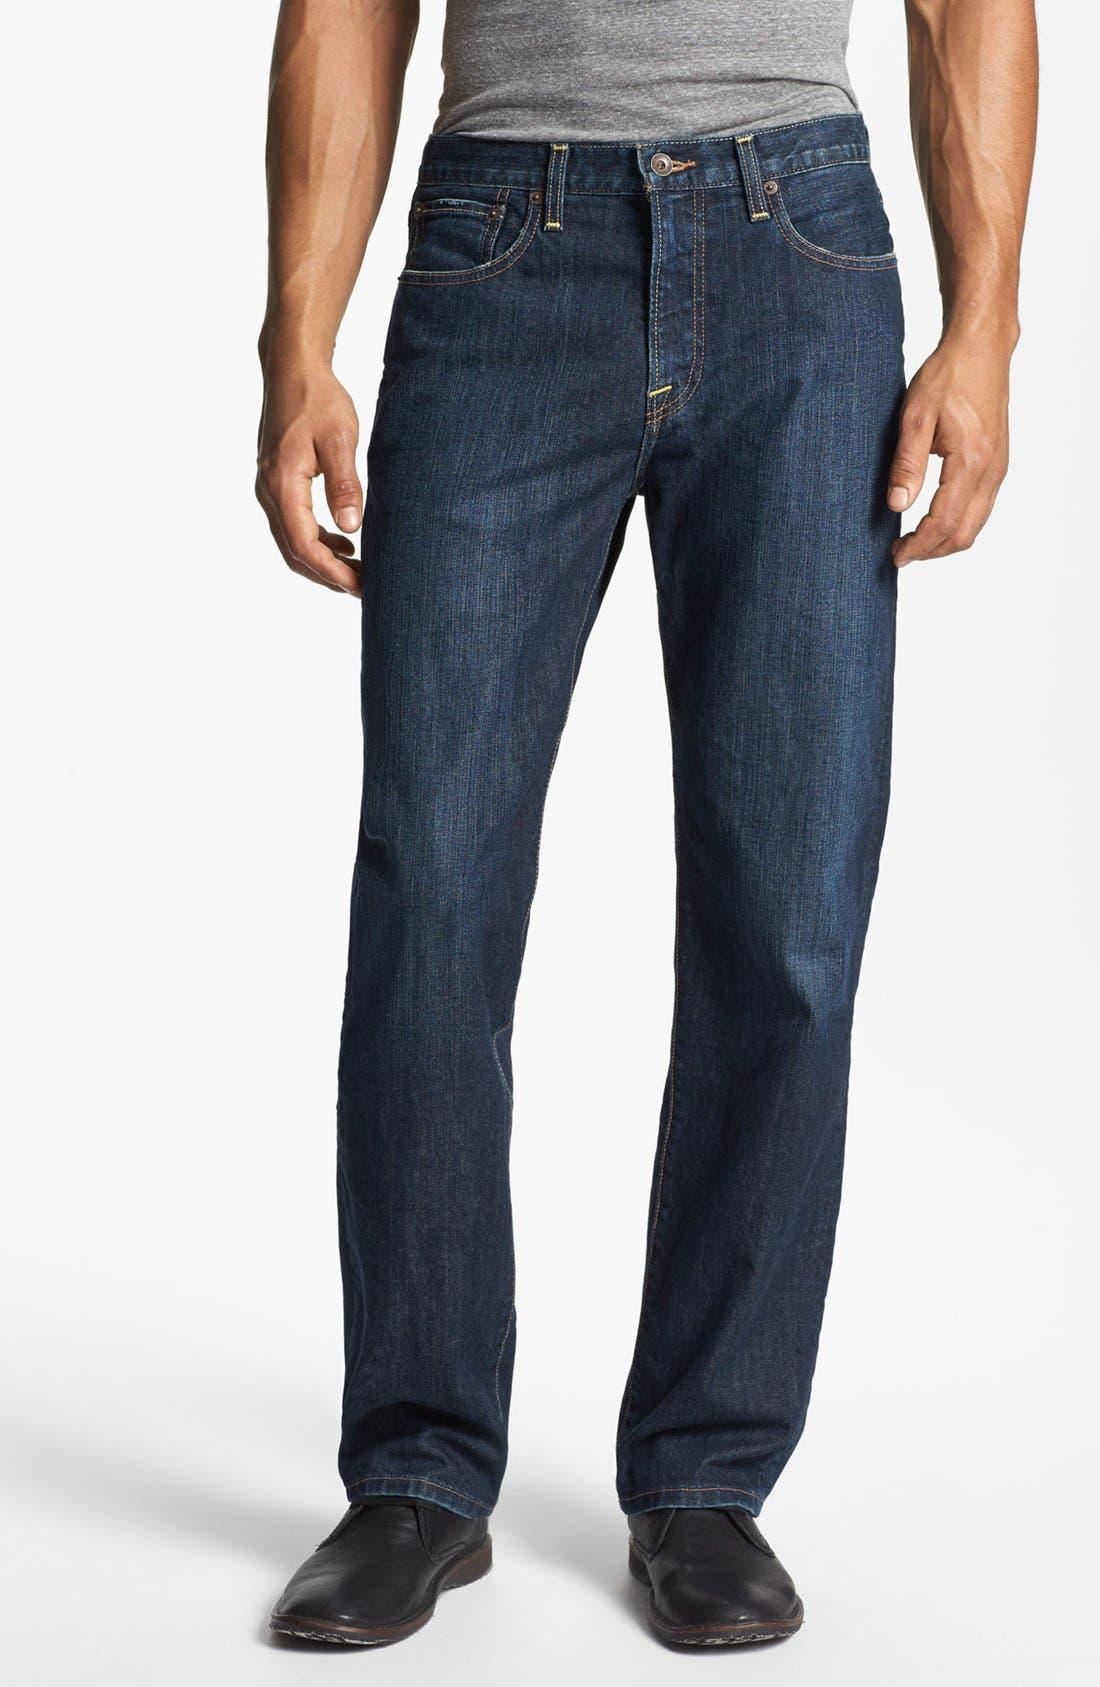 Alternate Image 1 Selected - Lucky Brand '329 Classic' Straight Leg Jeans (Murrell)